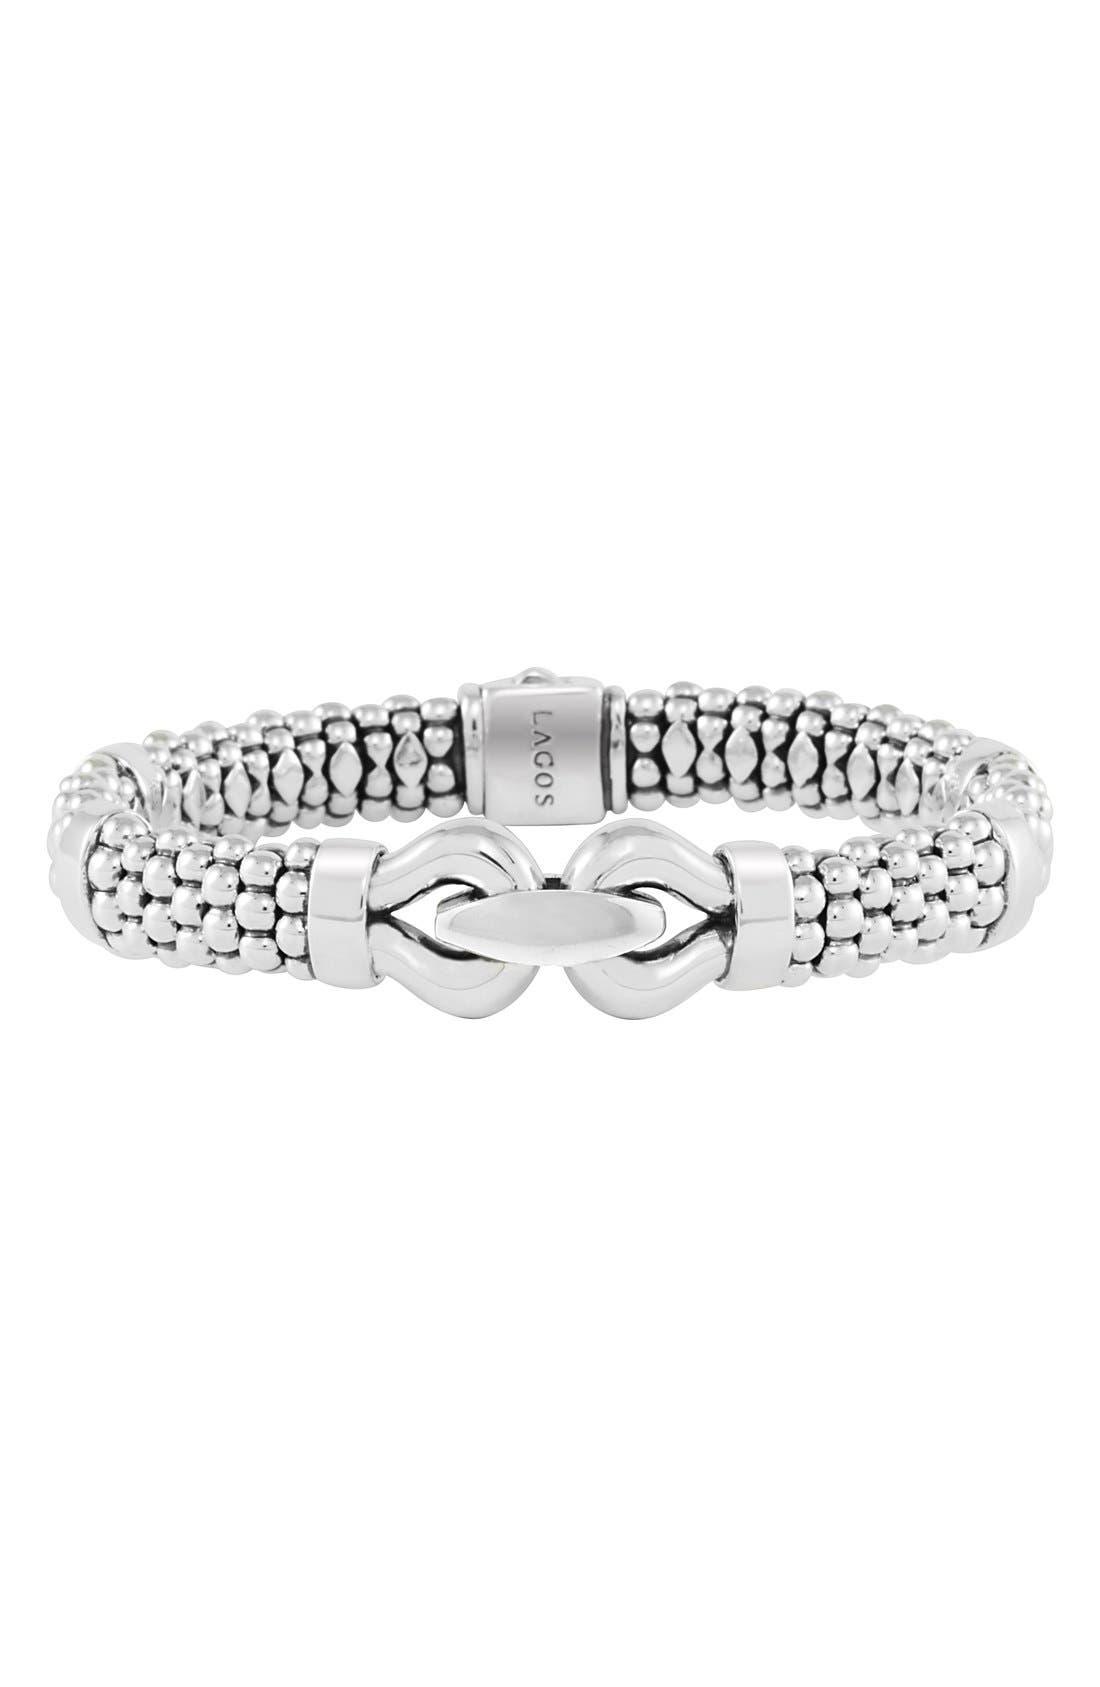 LAGOS Derby Caviar Rope Bracelet